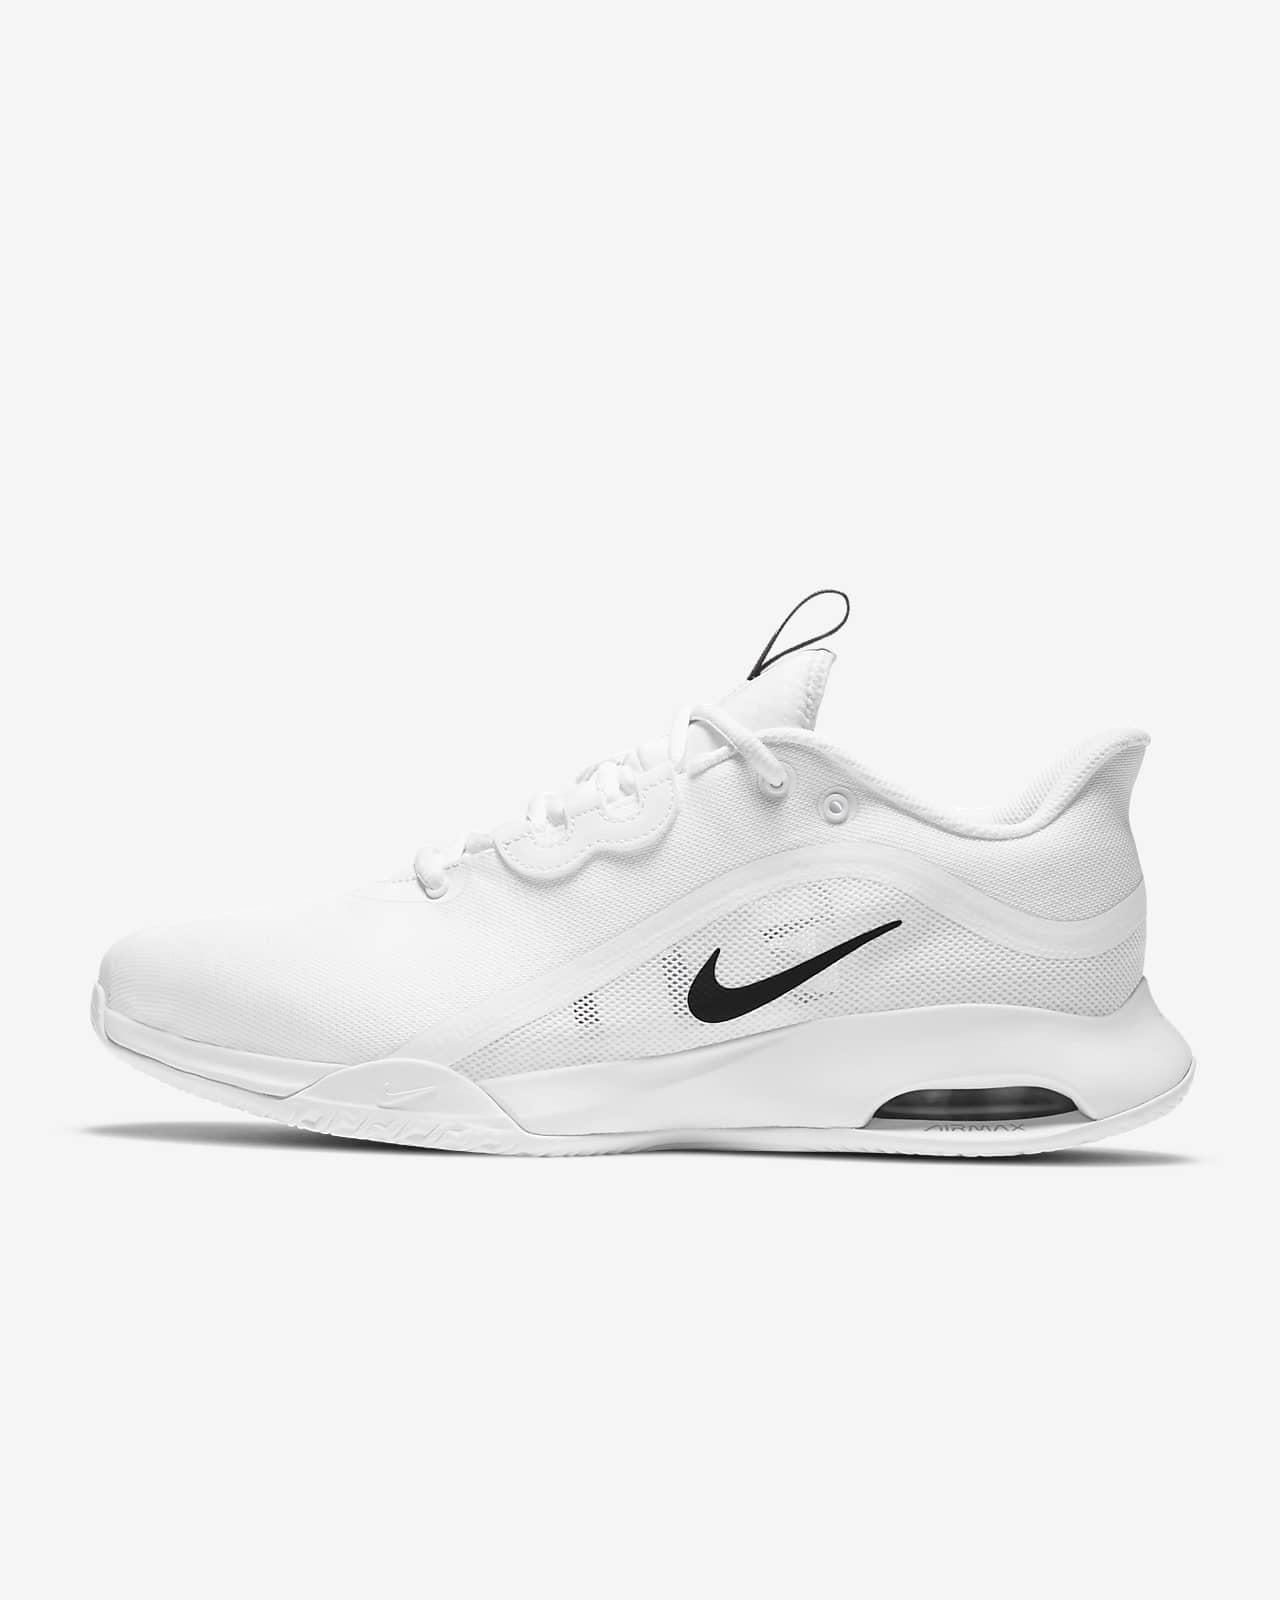 Chaussure de tennis pour surface dure NikeCourt Air Max Volley ...